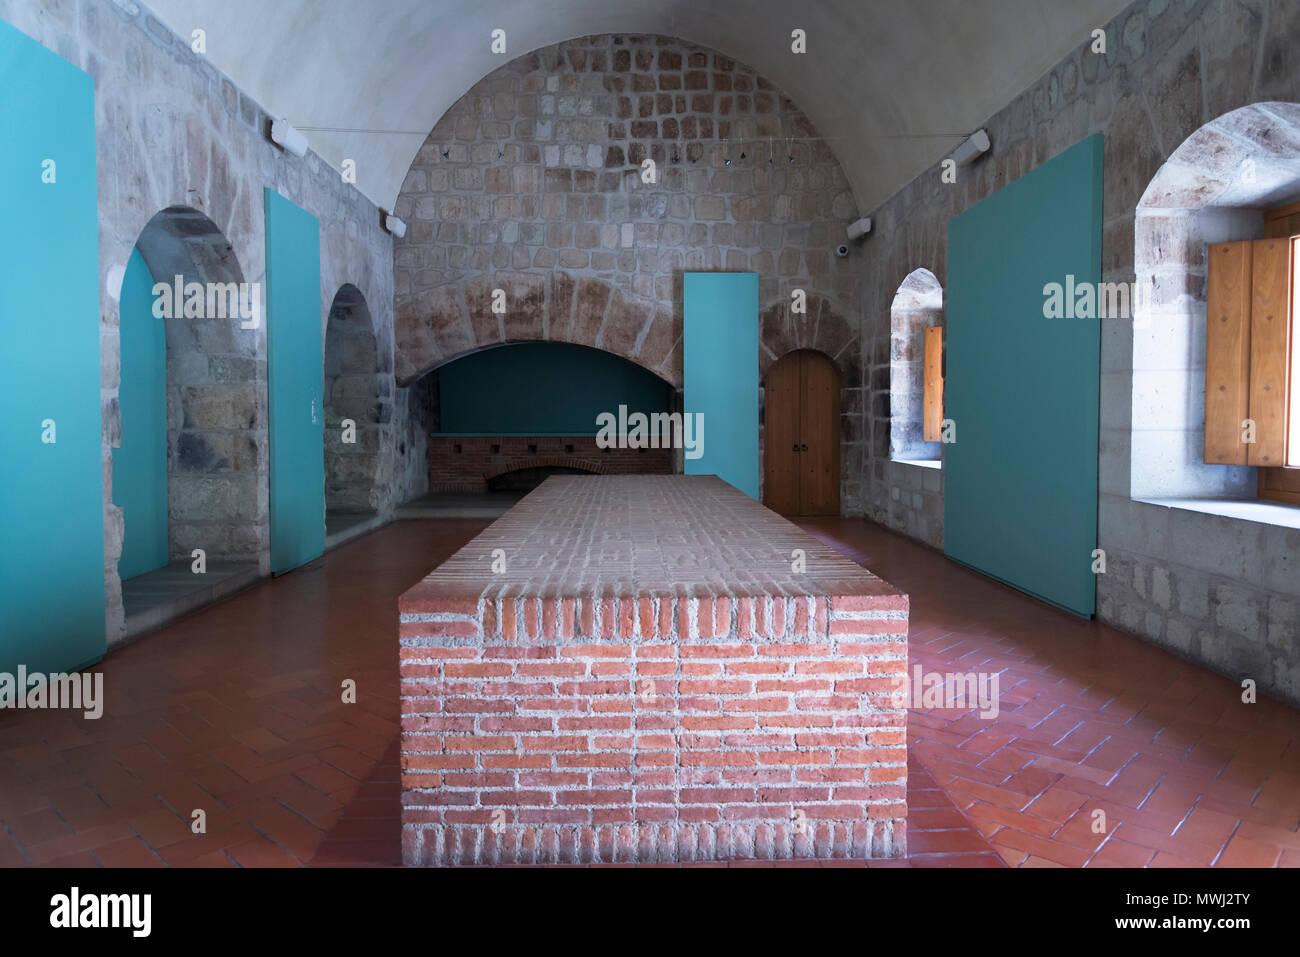 Museum Of Cultures Of Oaxaca, Former Santo Domingo De Guzman Convent,  Kitchen, Oaxaca, Mexico